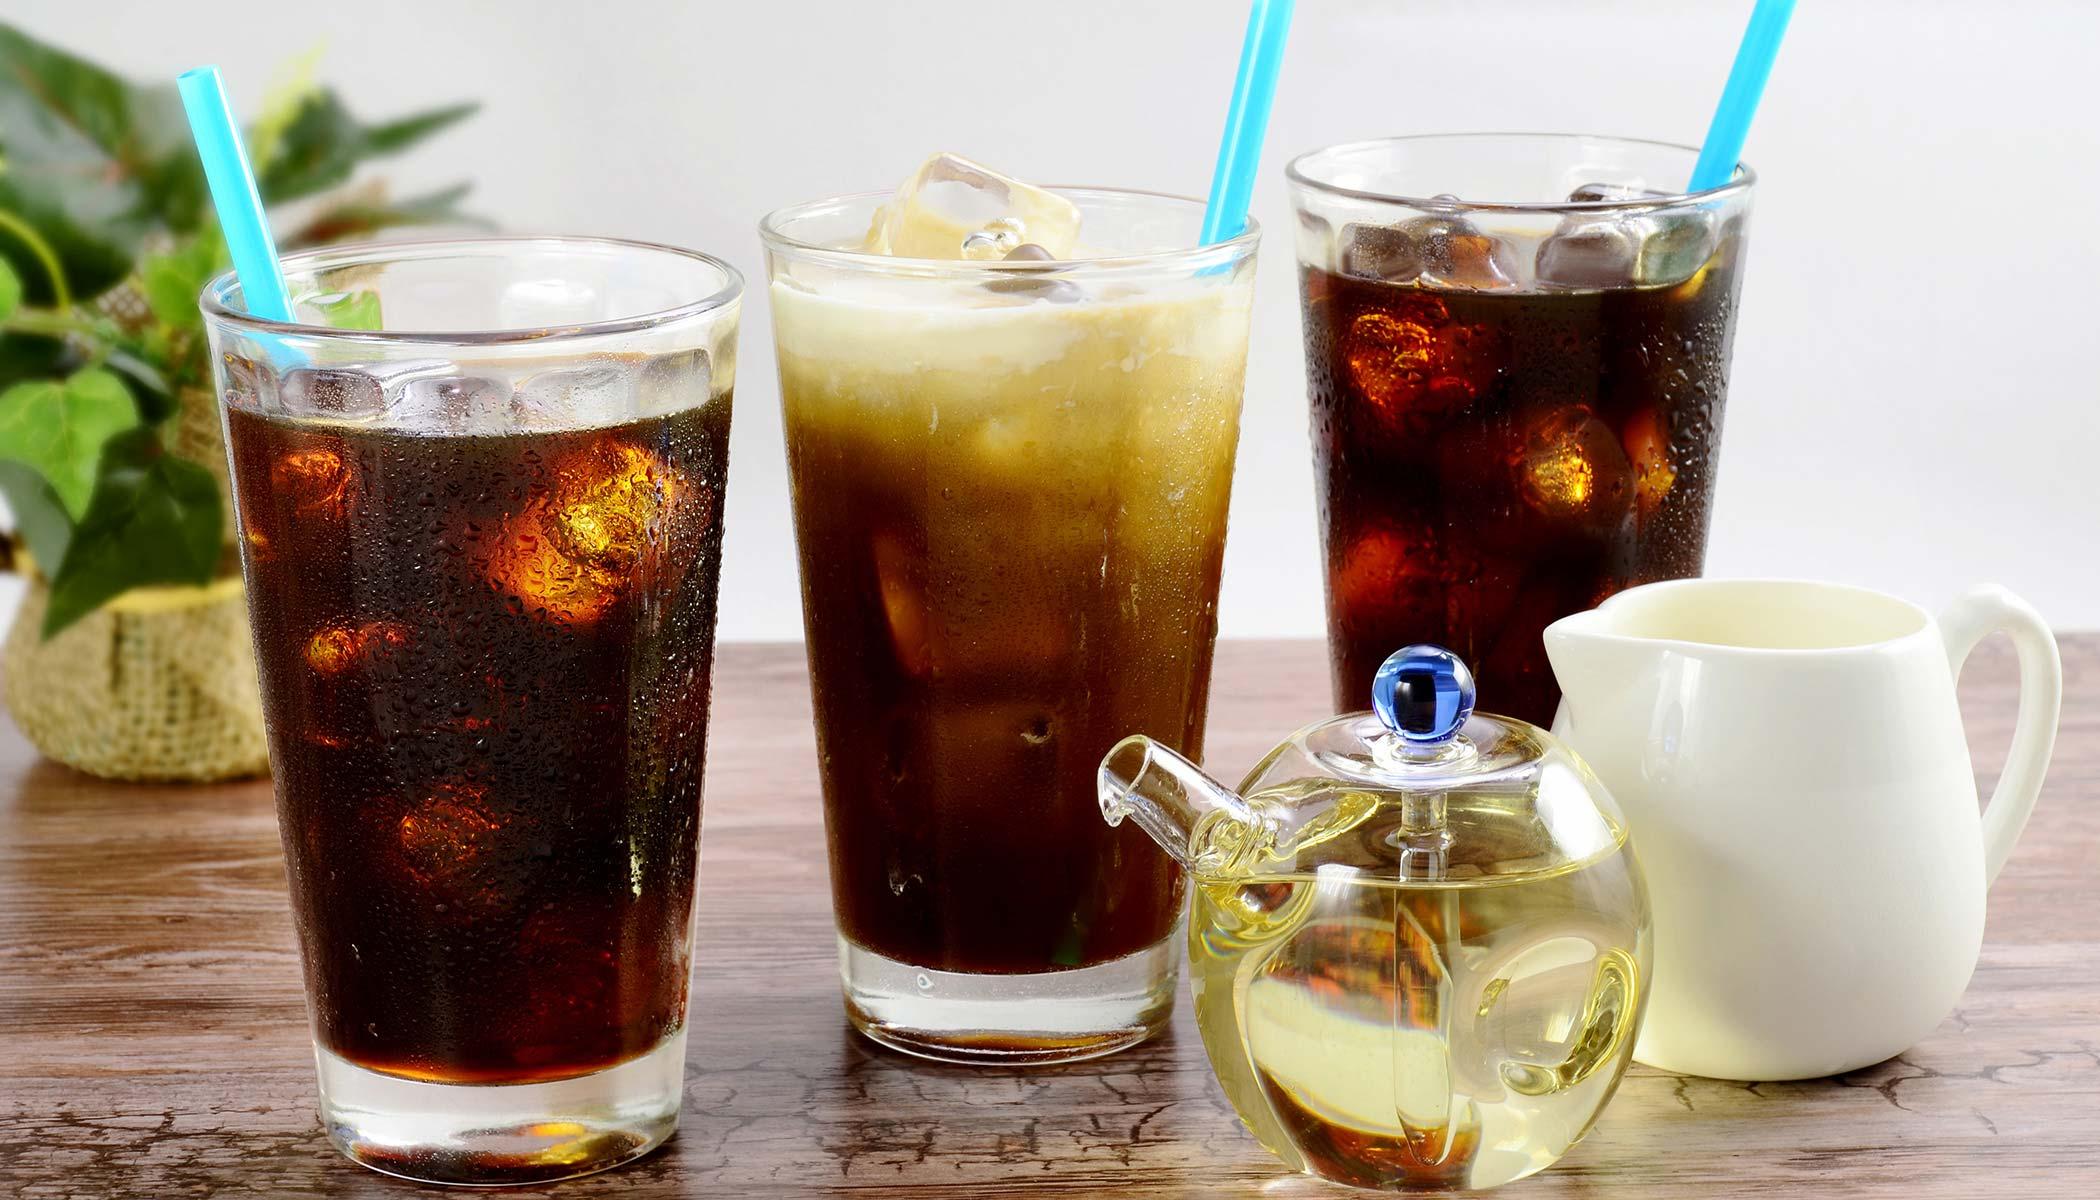 Simply Iced Coffee